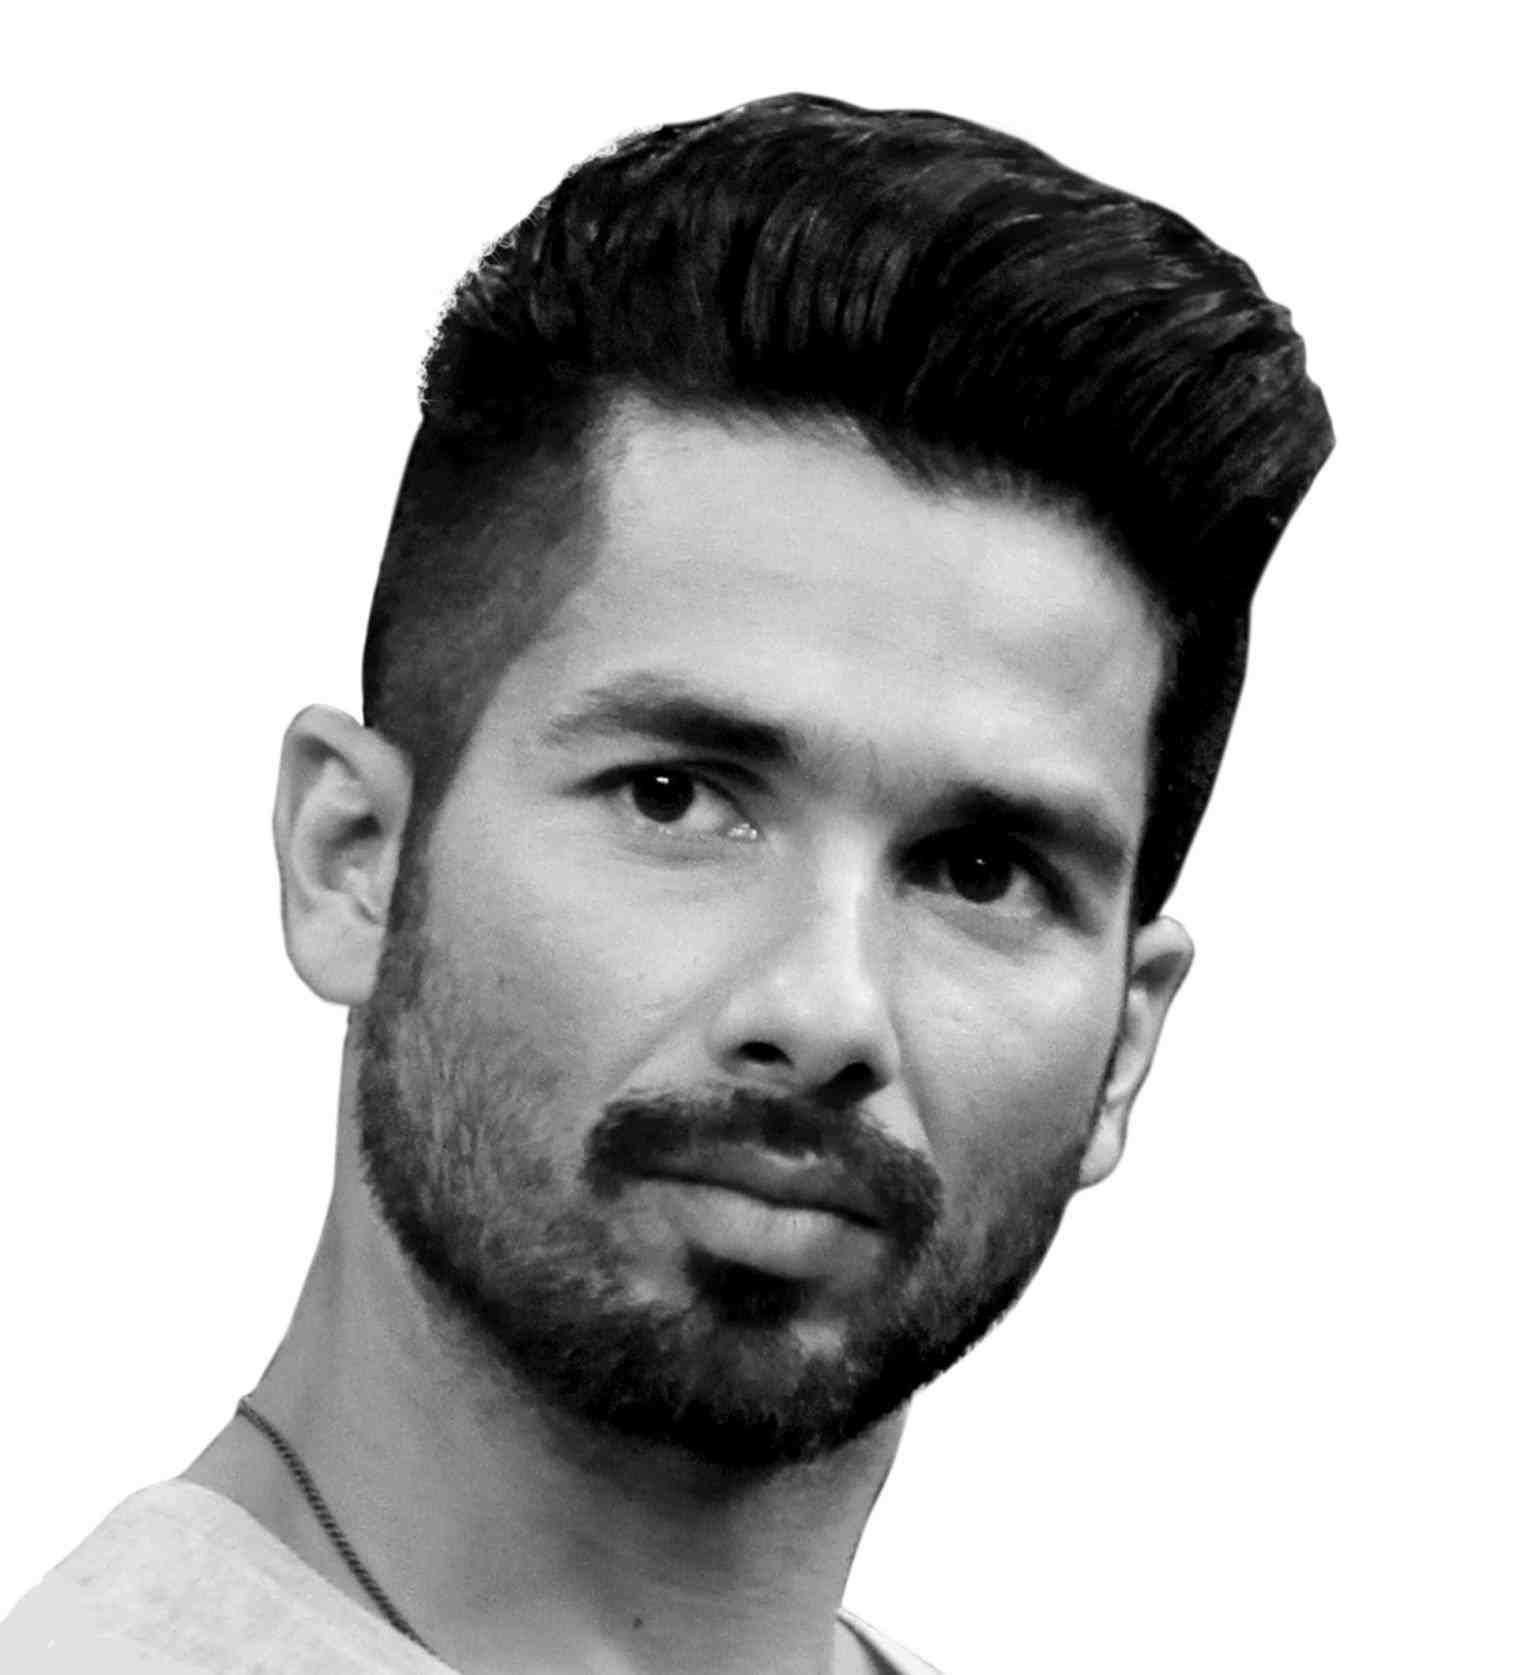 Indian Hair Style Man Simple - Wavy Haircut